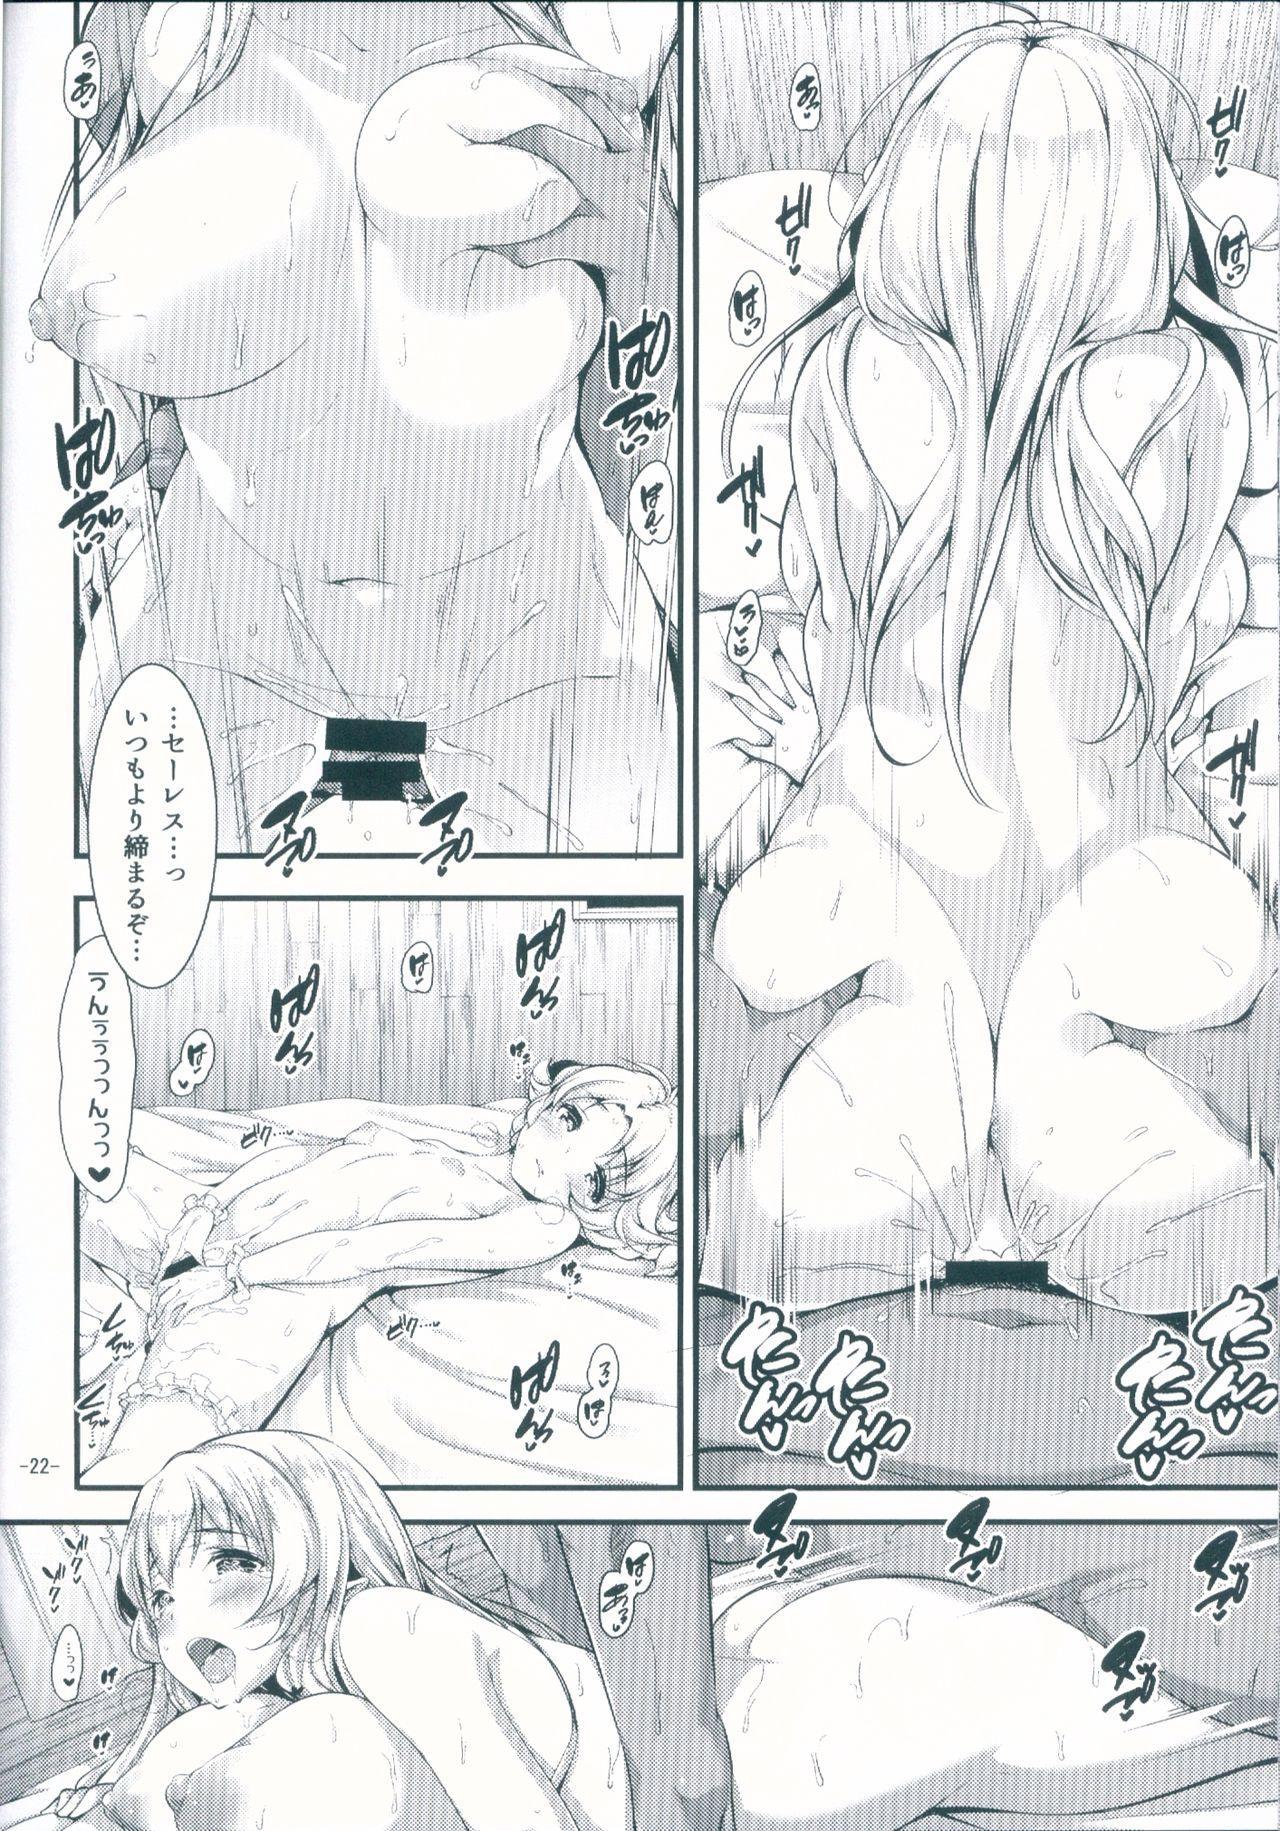 Isekai no Hanayome 21